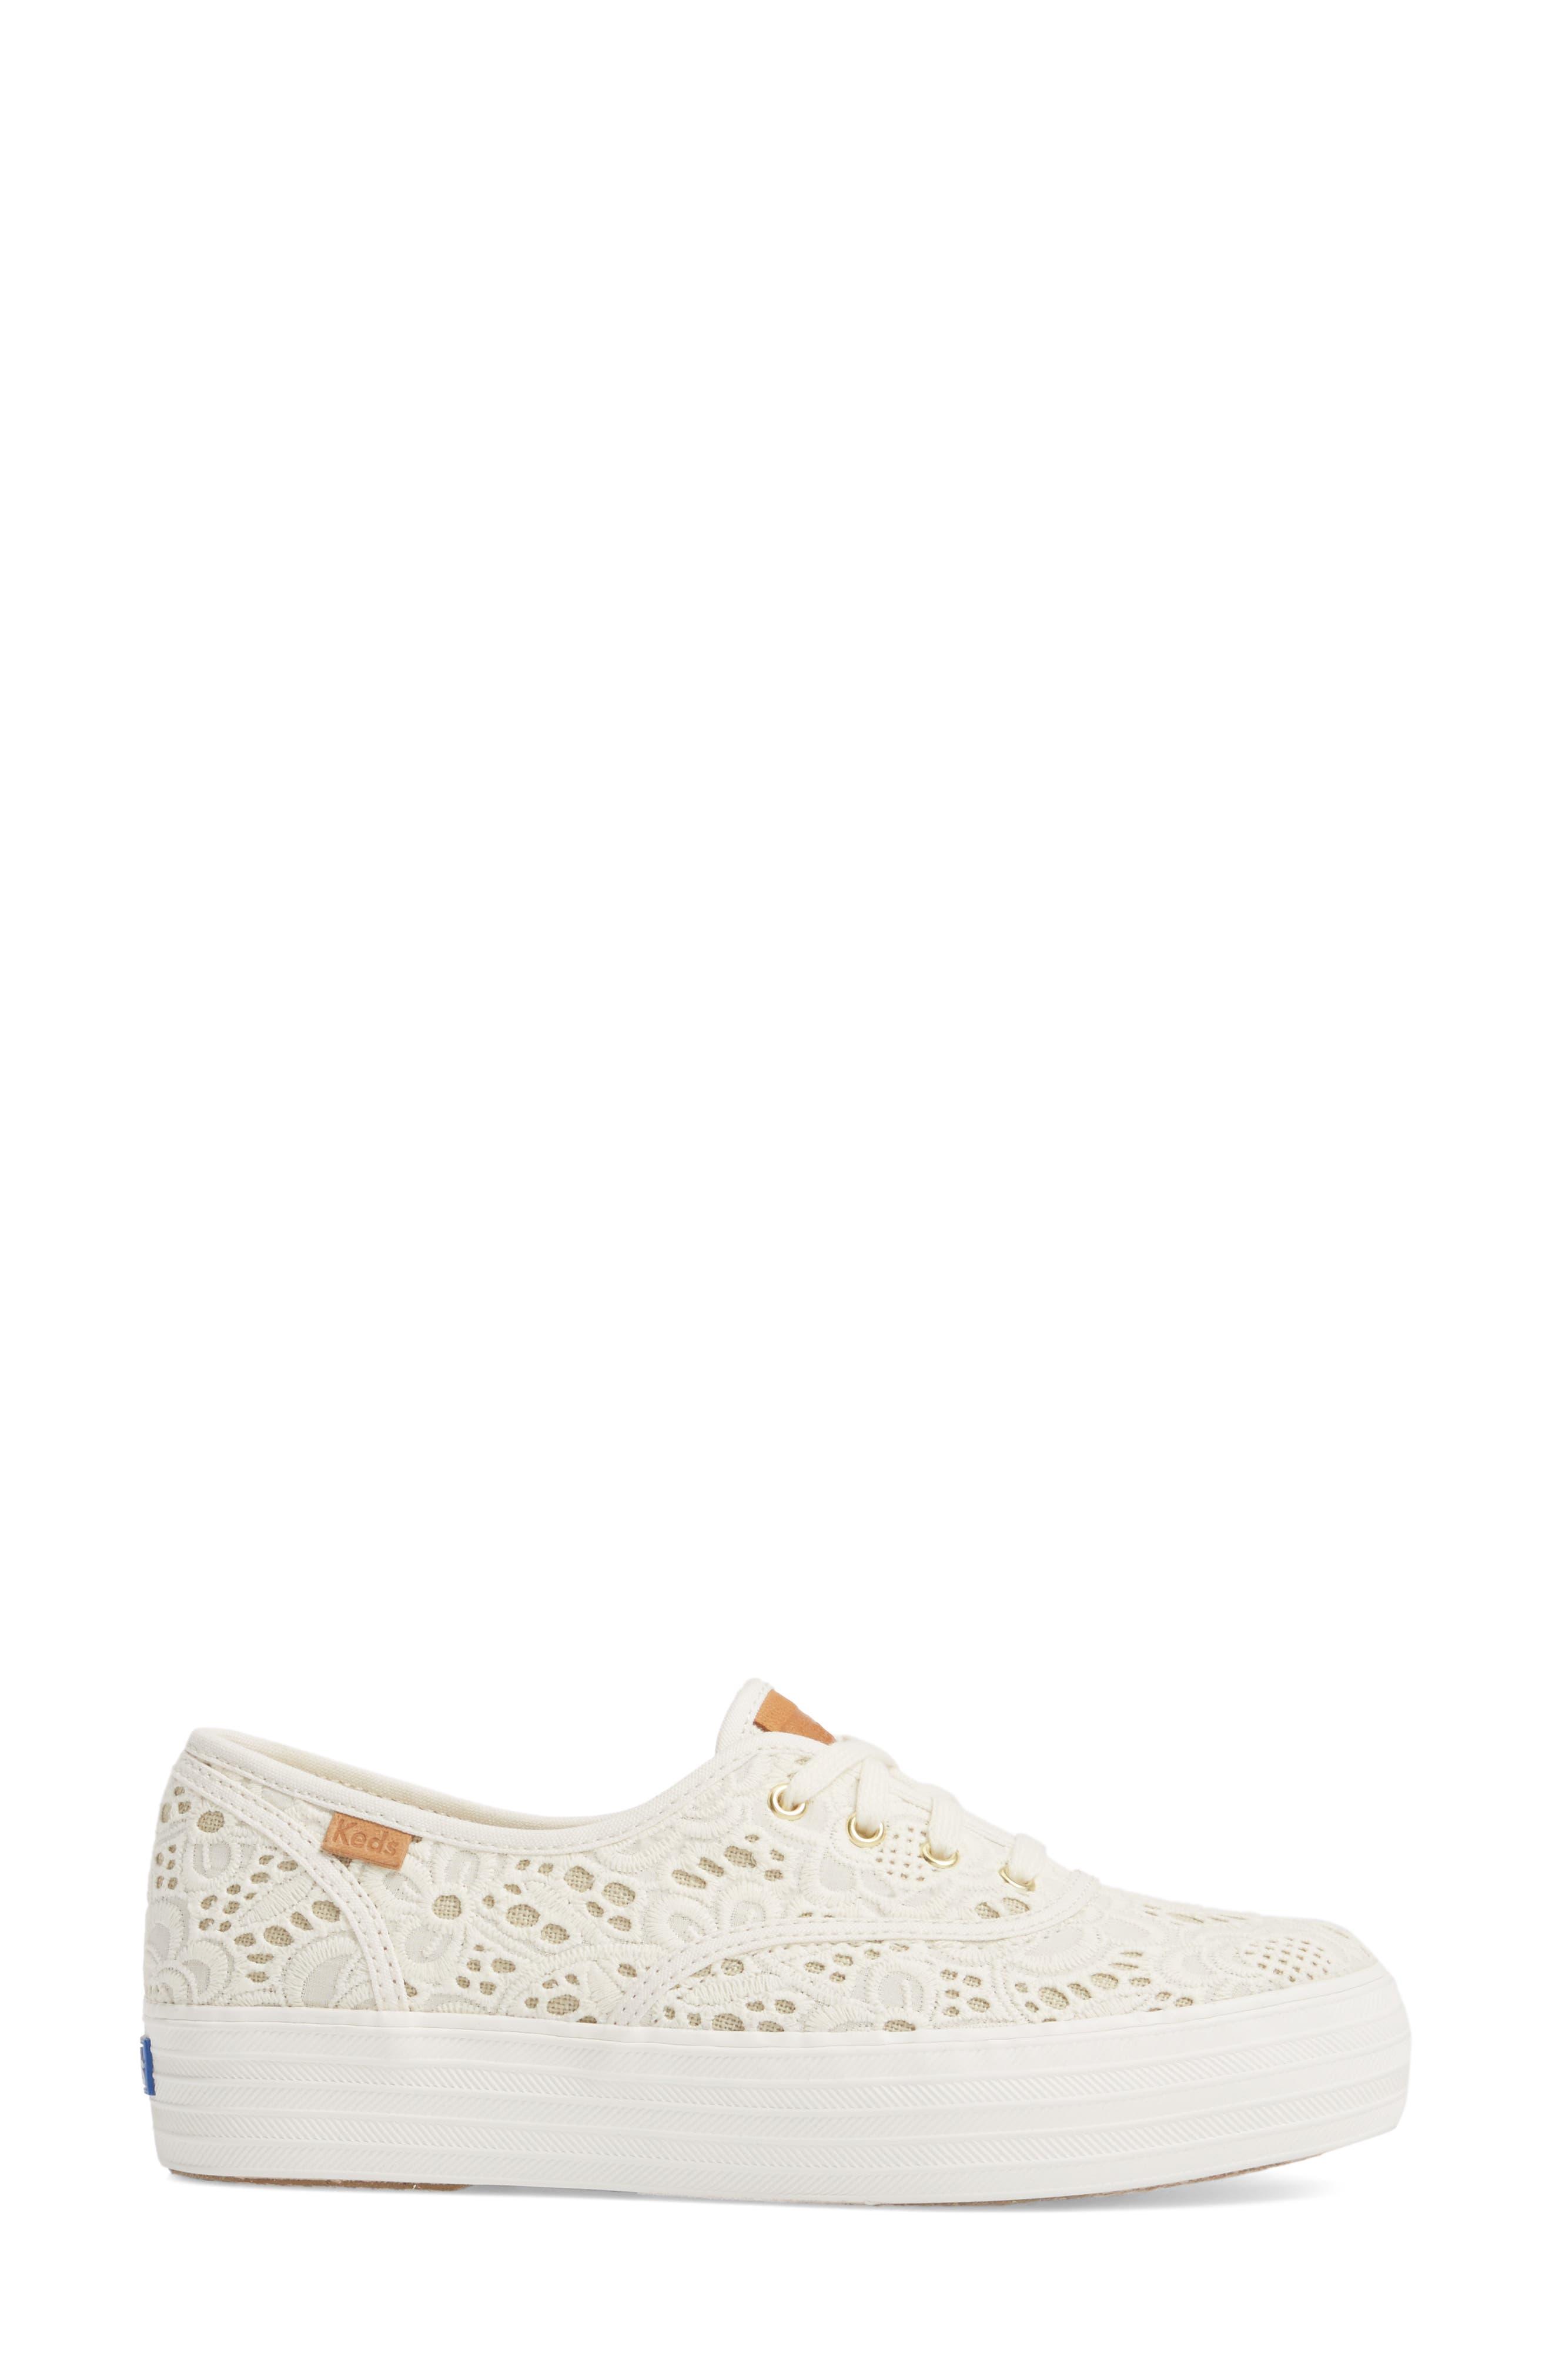 Alternate Image 3  - Keds® Triple Embroidered Crochet Platform Sneaker (Women)